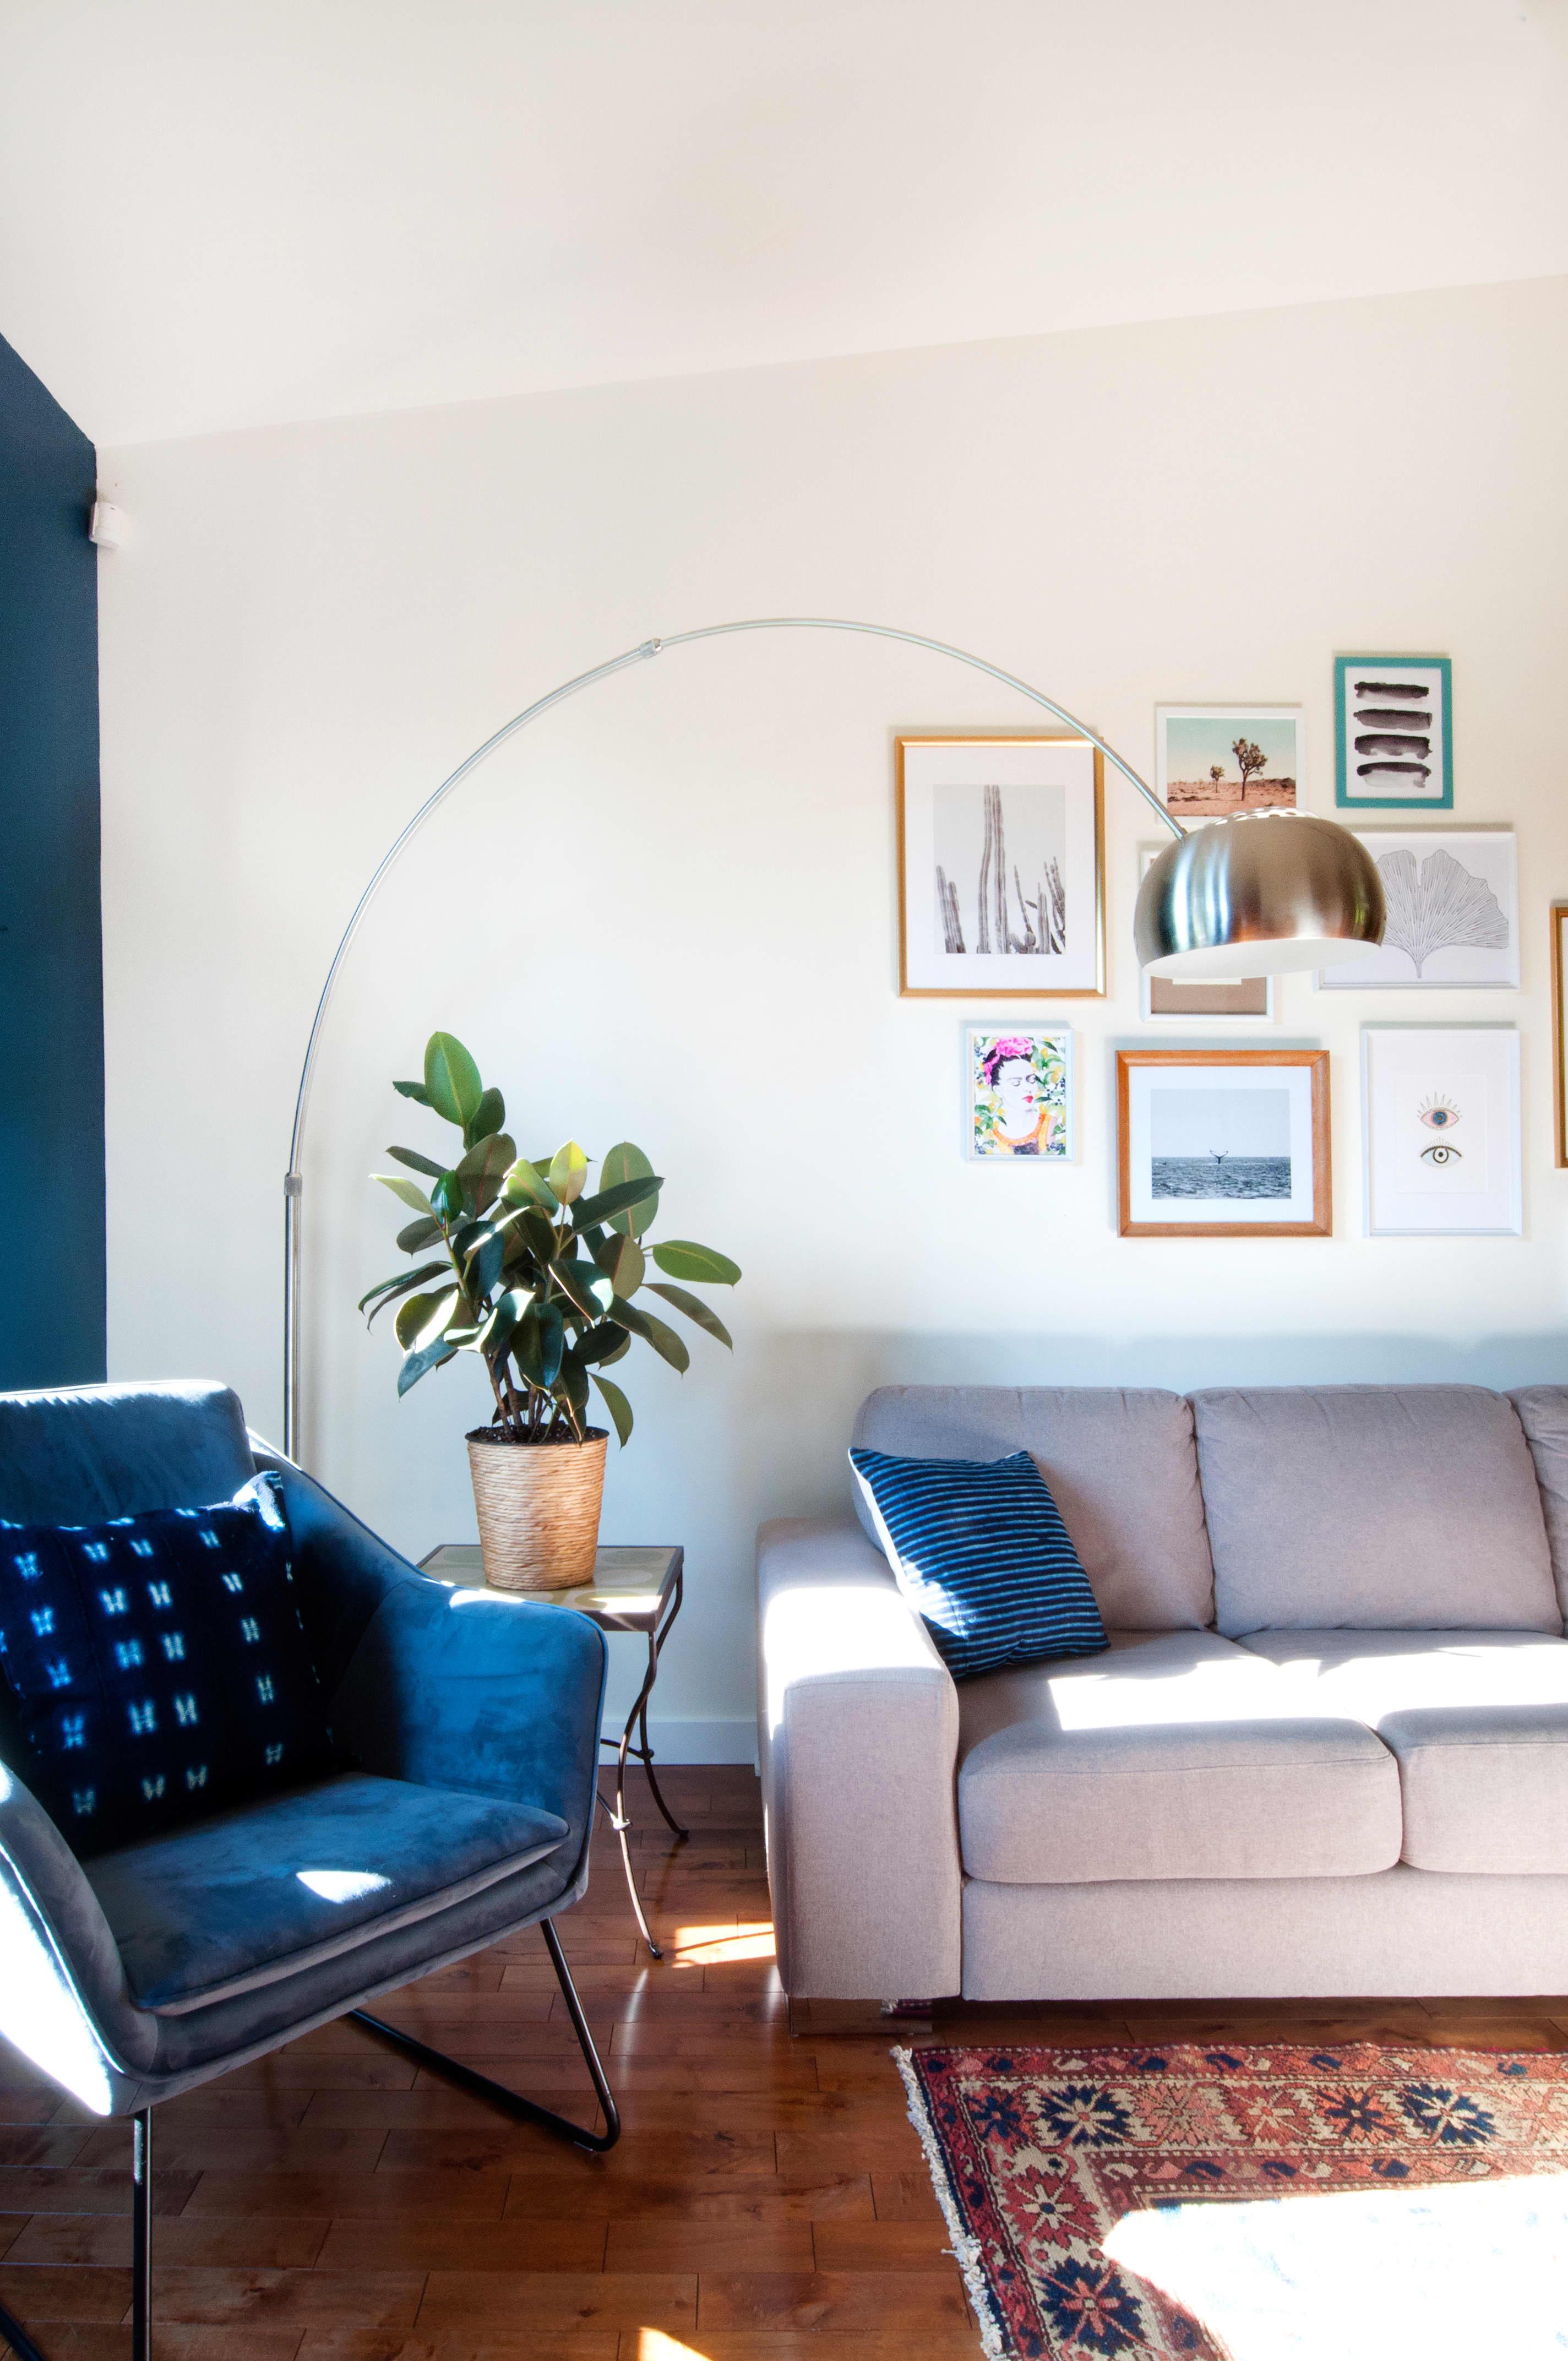 California Bohemian Vintage Decor Inspiration | Apartment ...